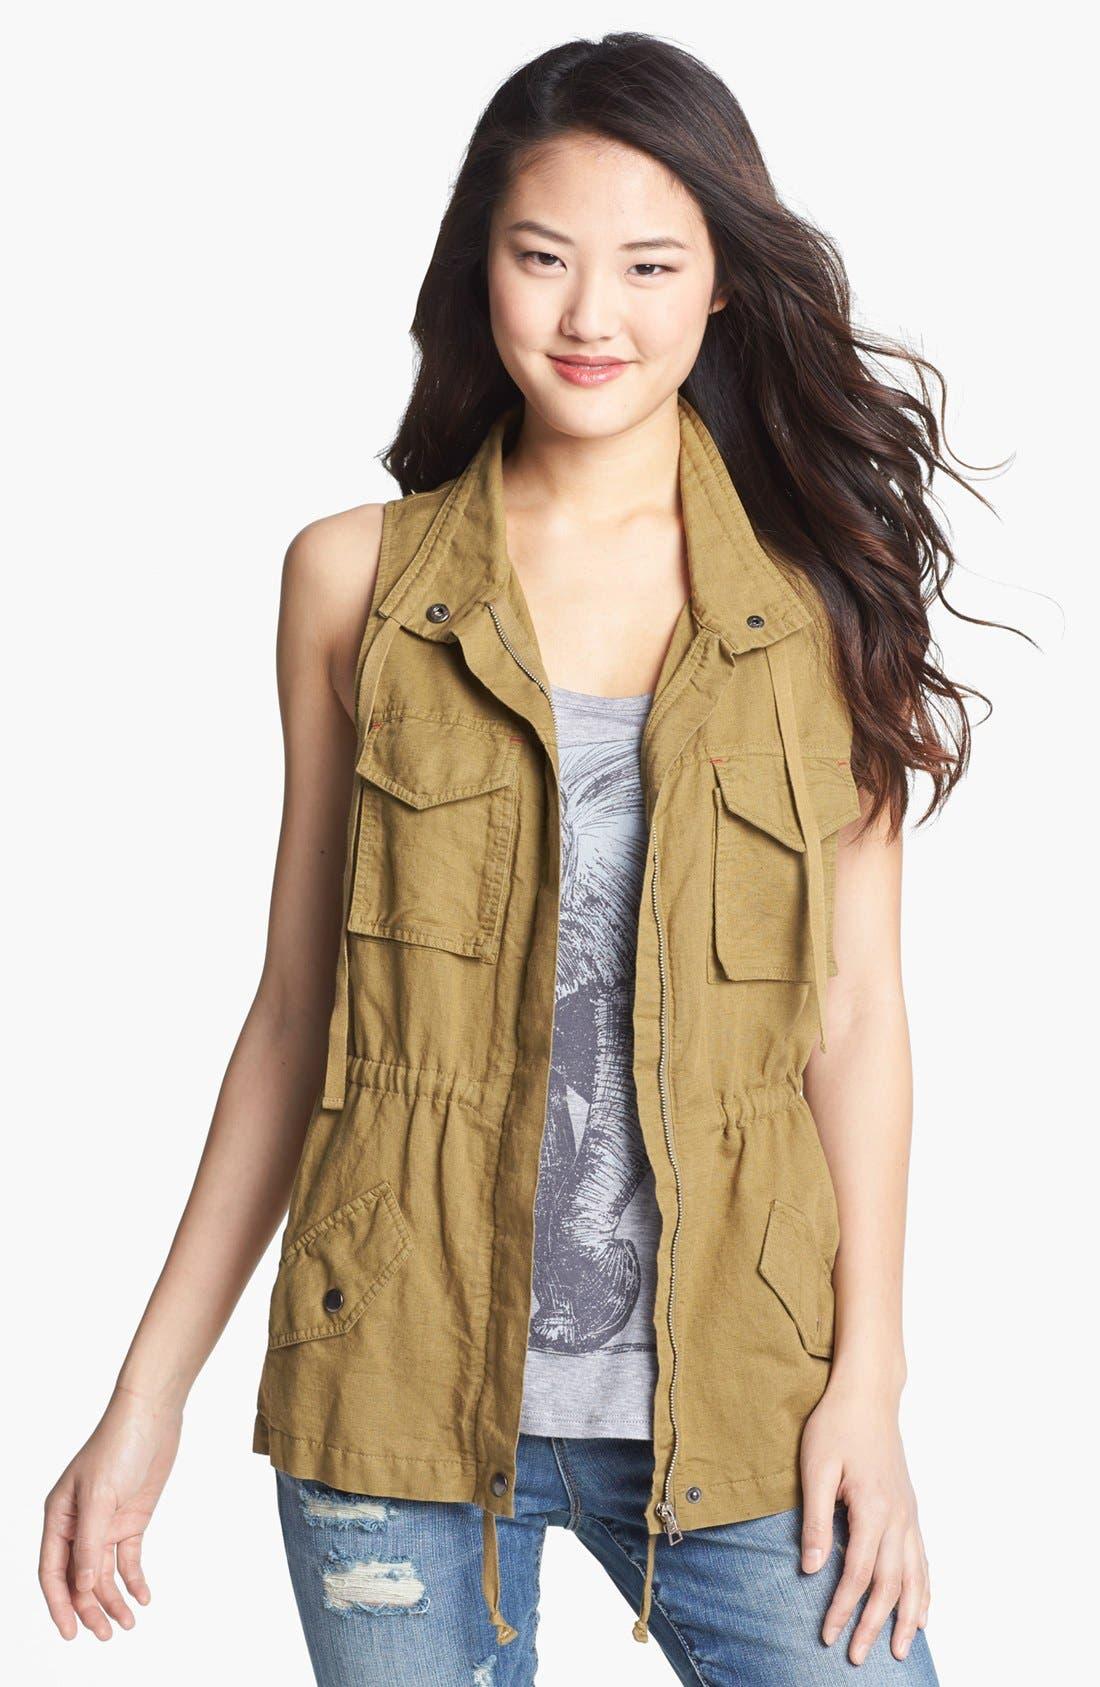 Alternate Image 1 Selected - C & C California Safari Vest (Online Only)